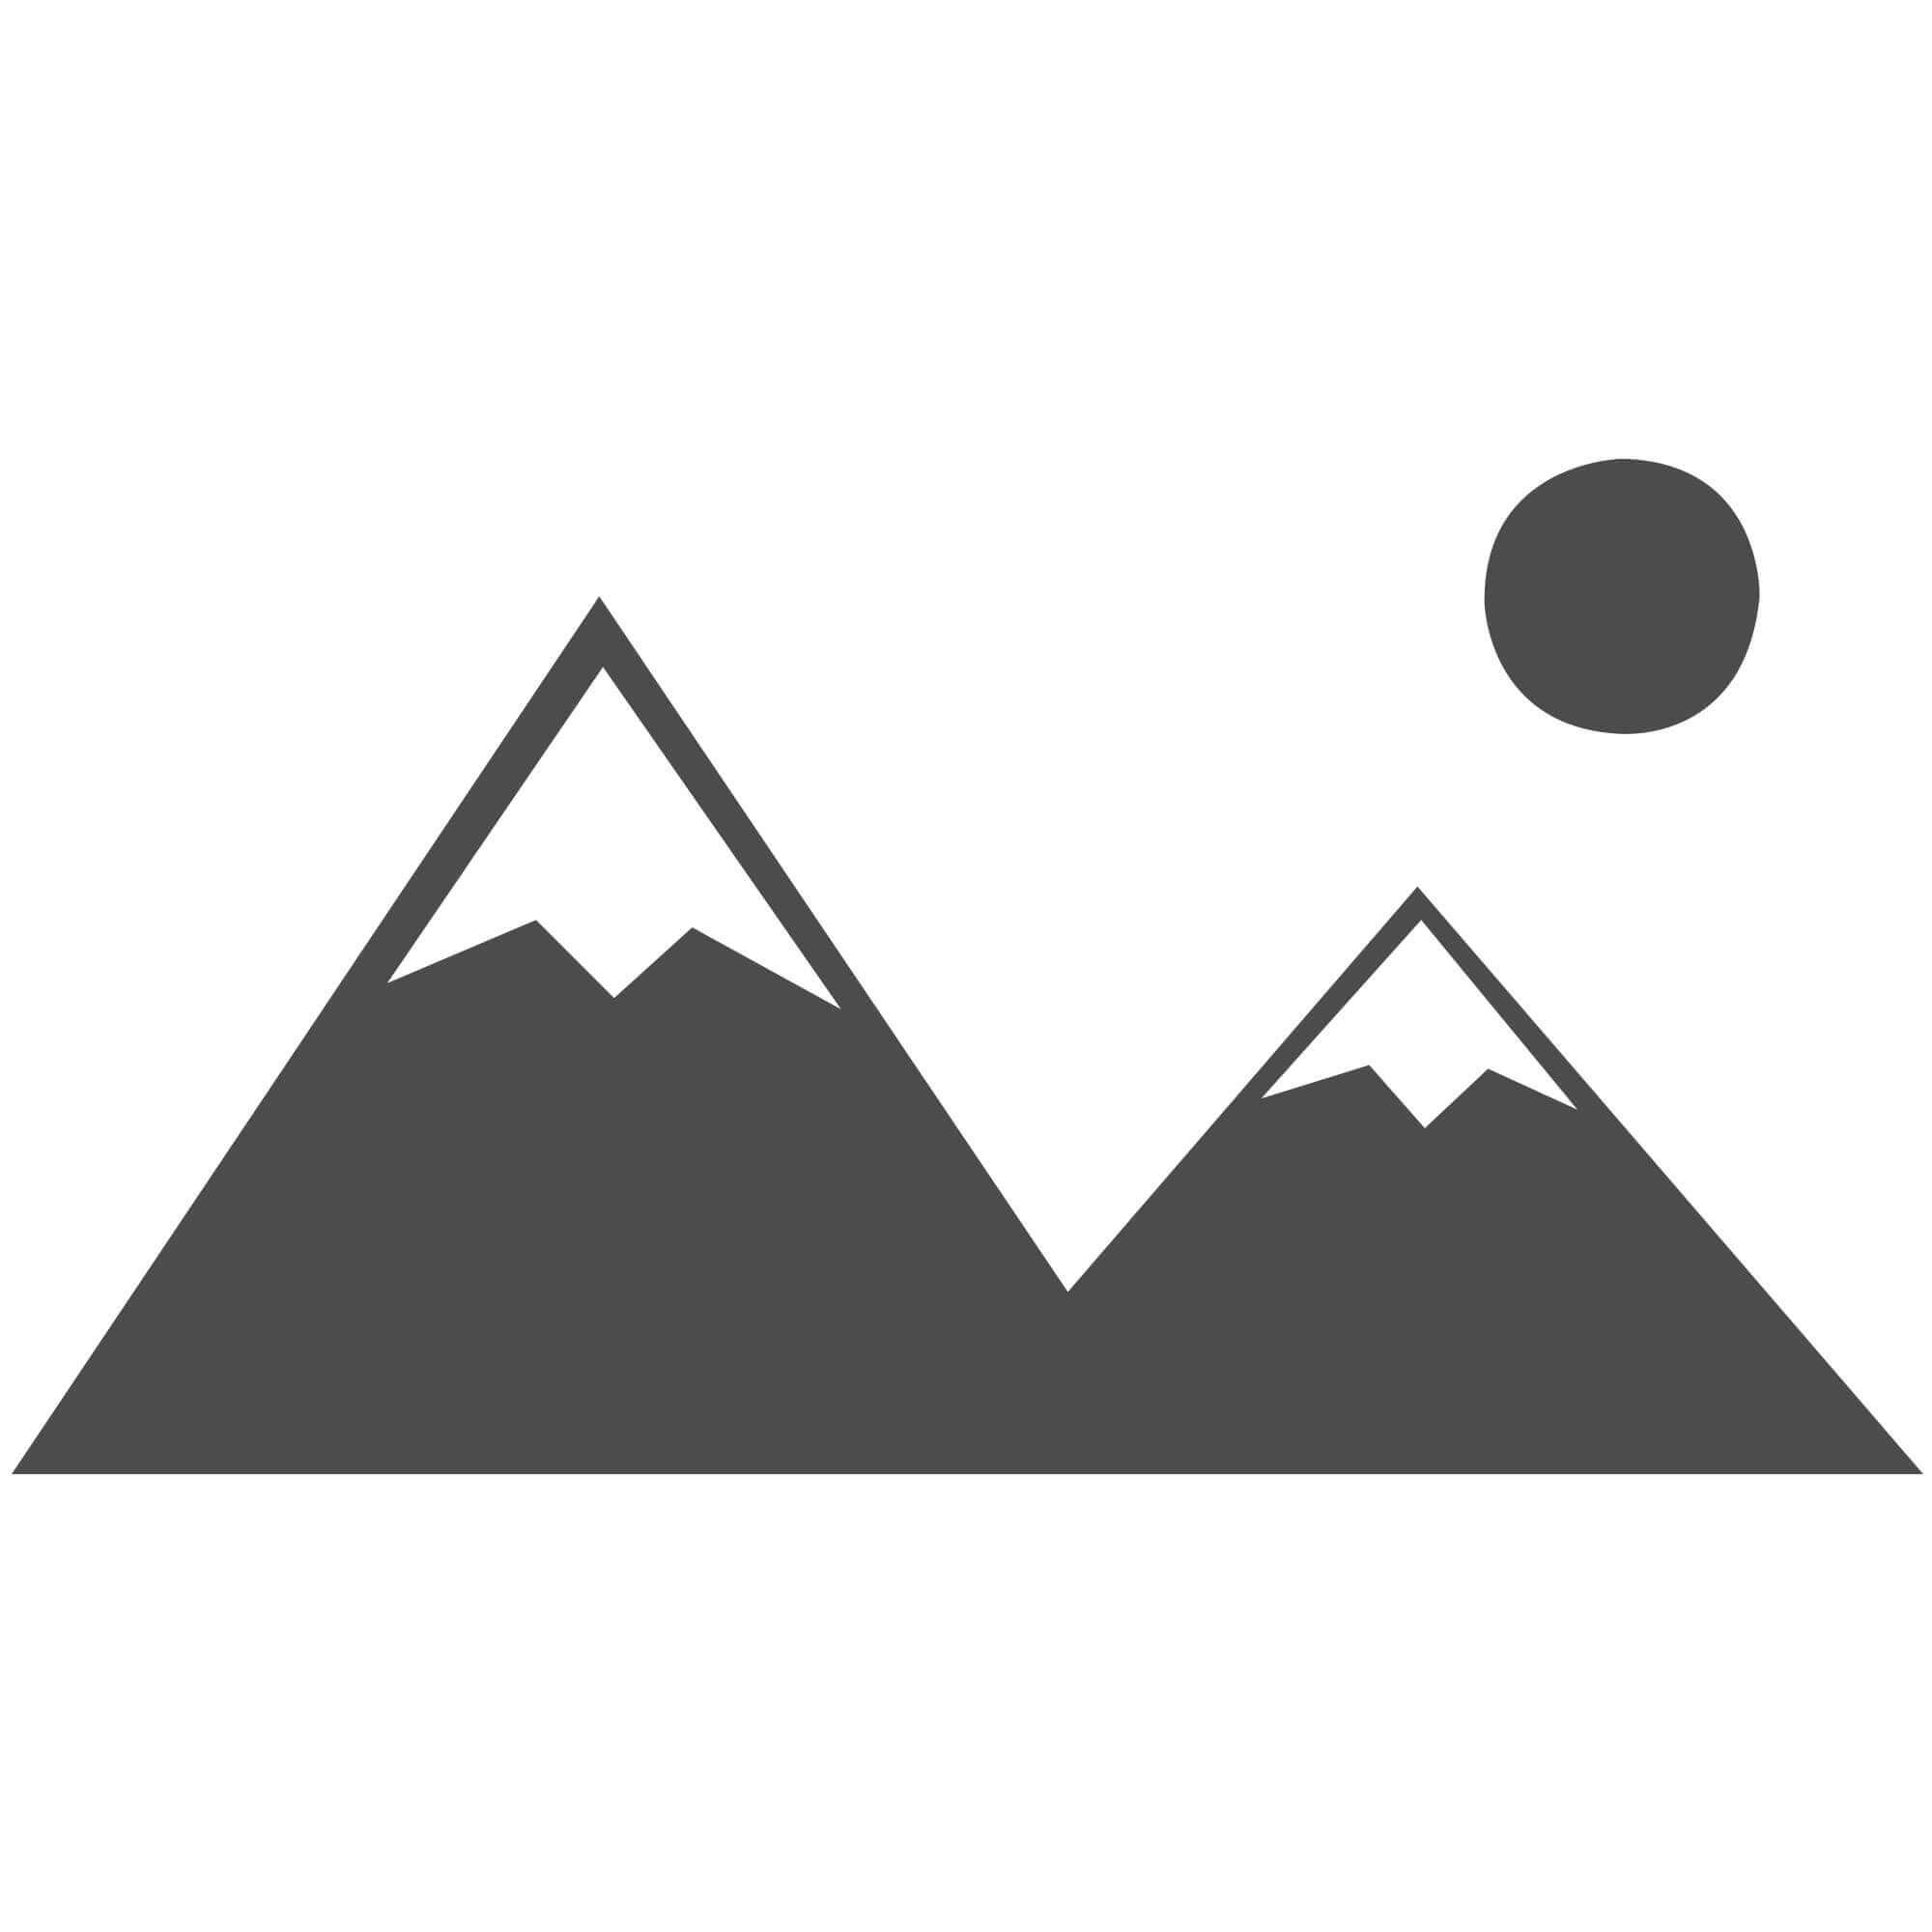 "Griot Stripe Rug - Ngoma - KI801 Indigo-76 x 122 cm (2'6"" x 4')"